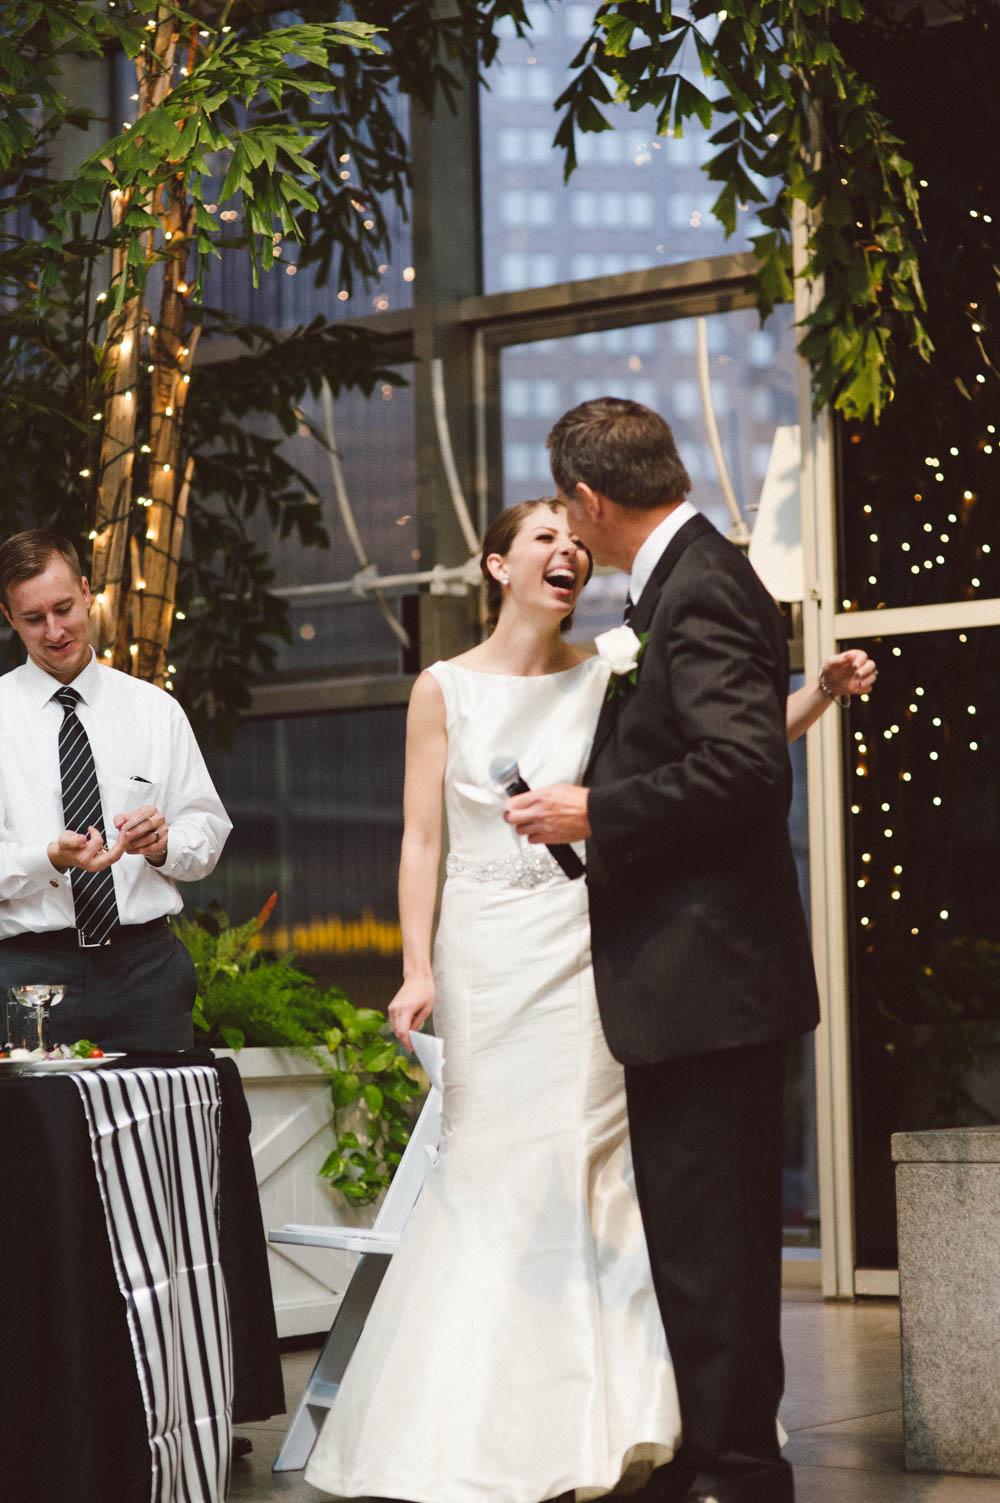 wintergarden-wedding-pittsburgh-128.jpg